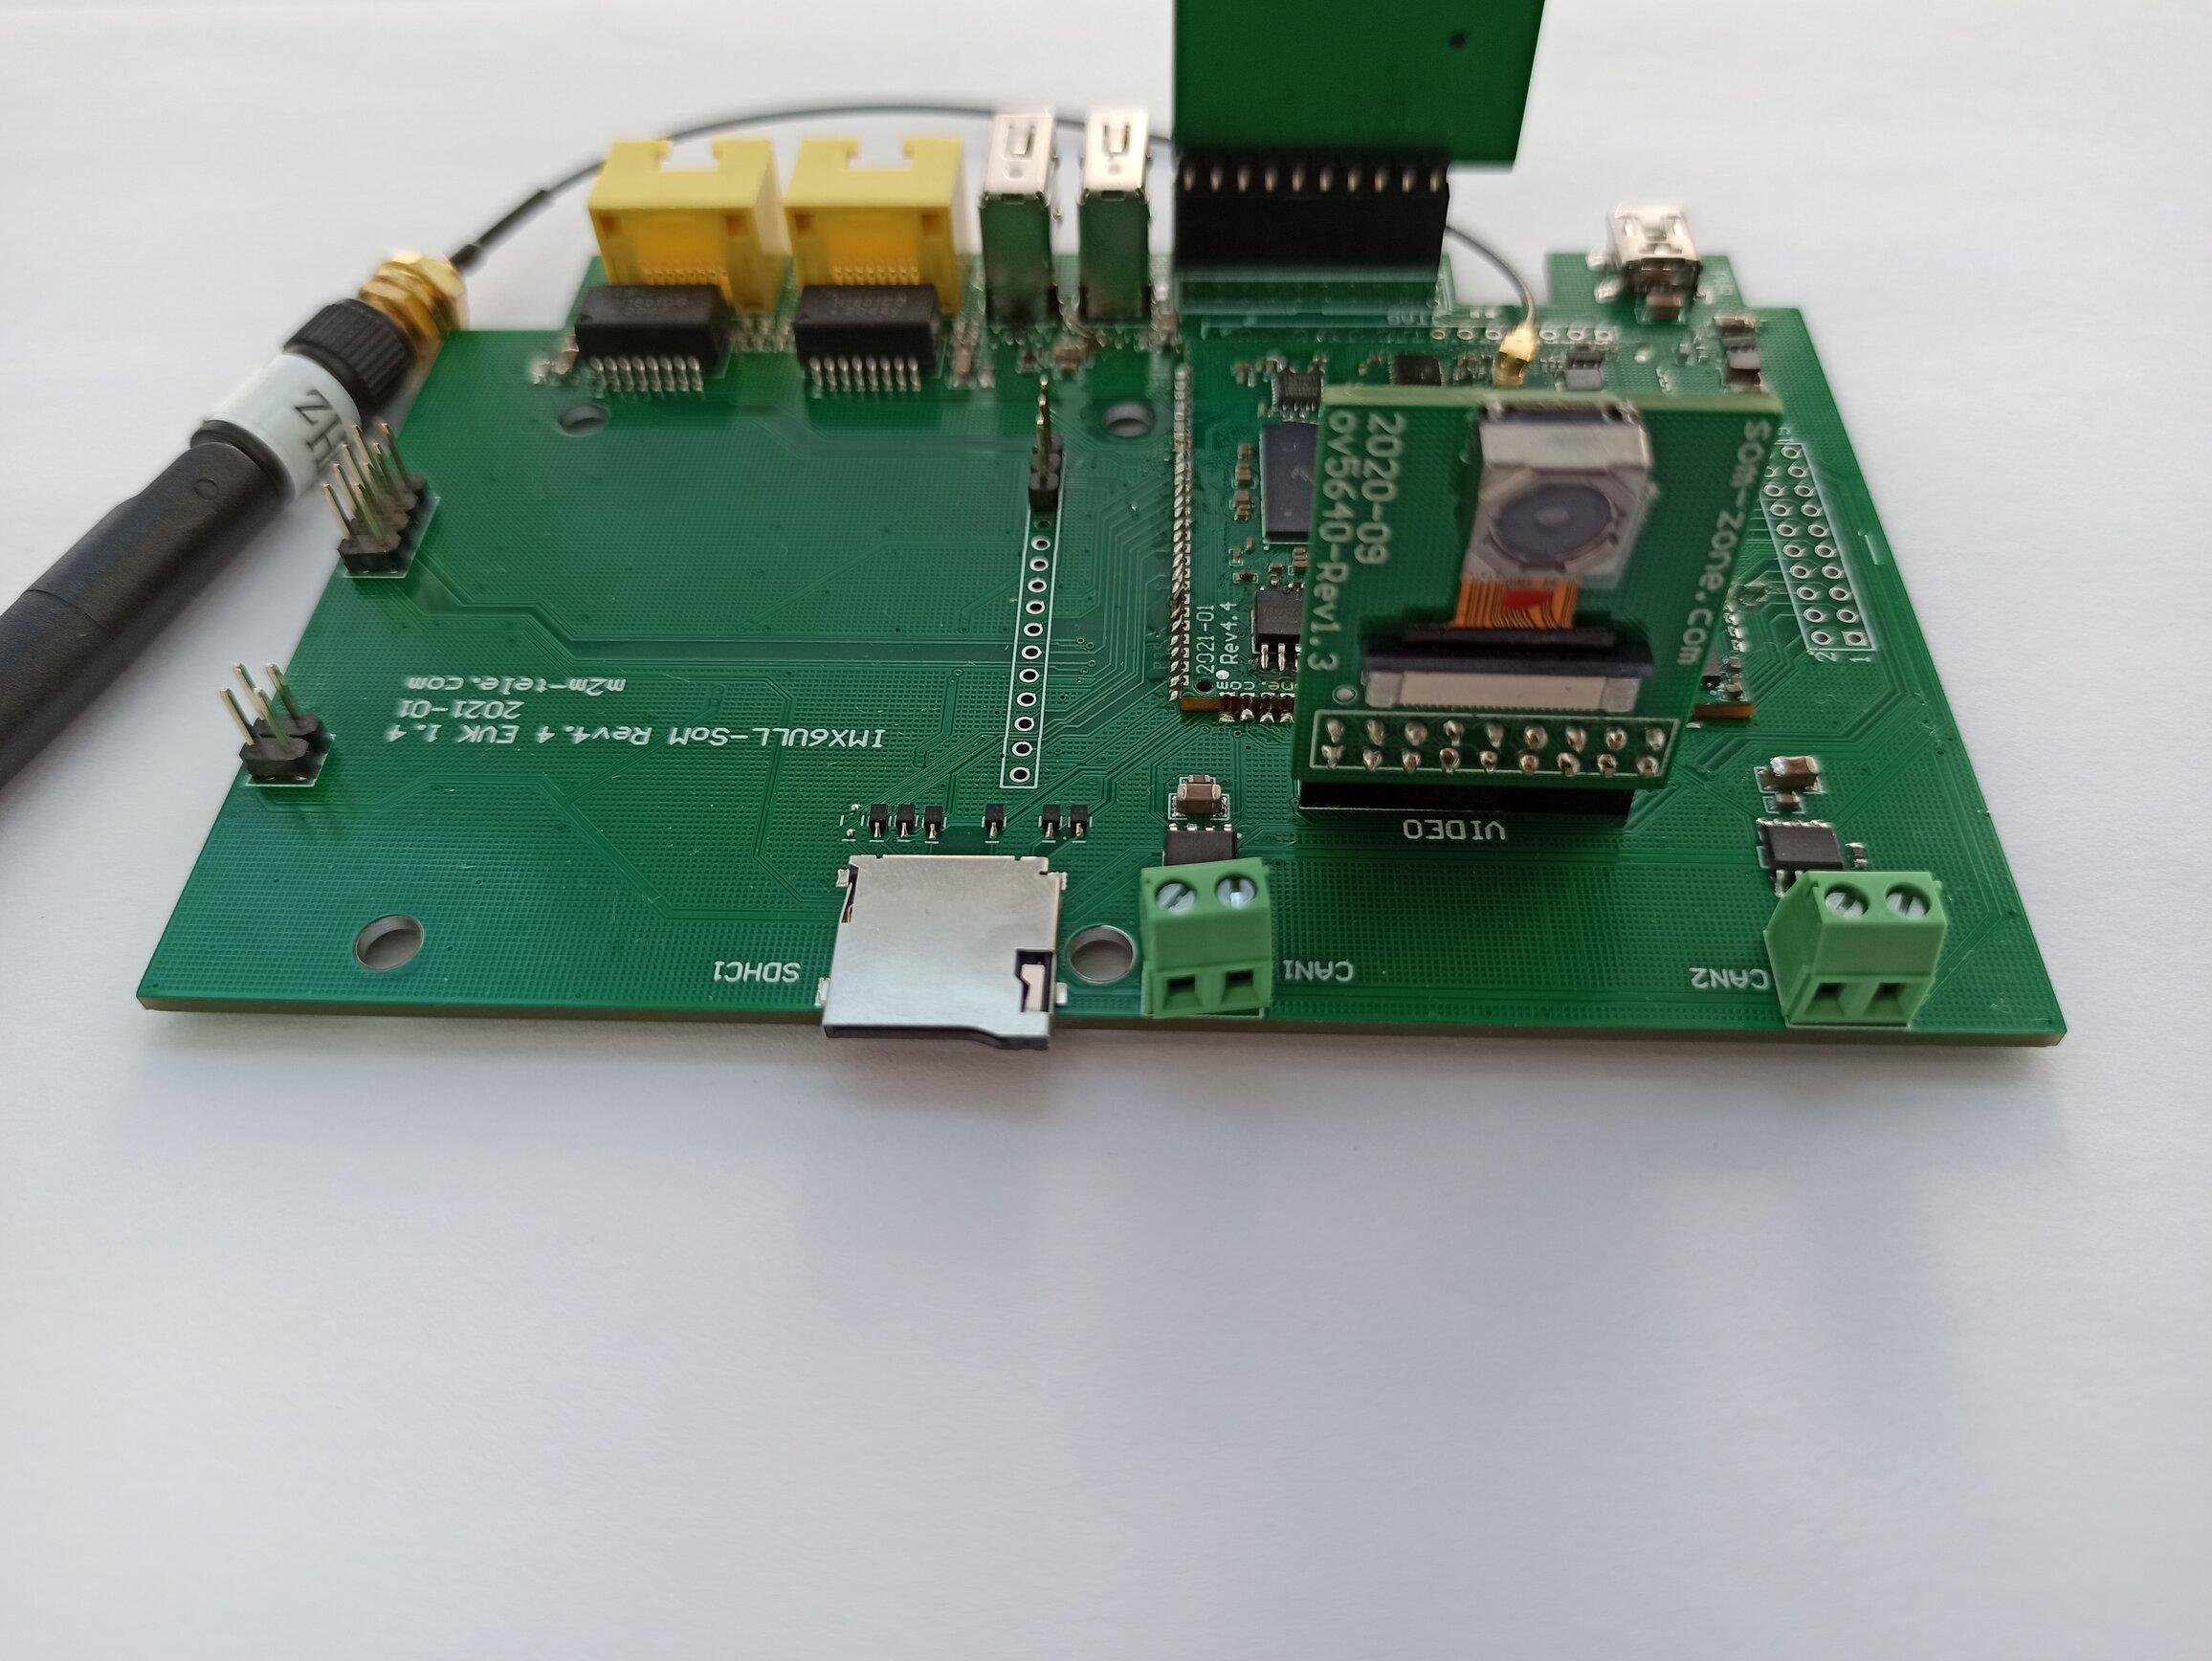 openwrt board